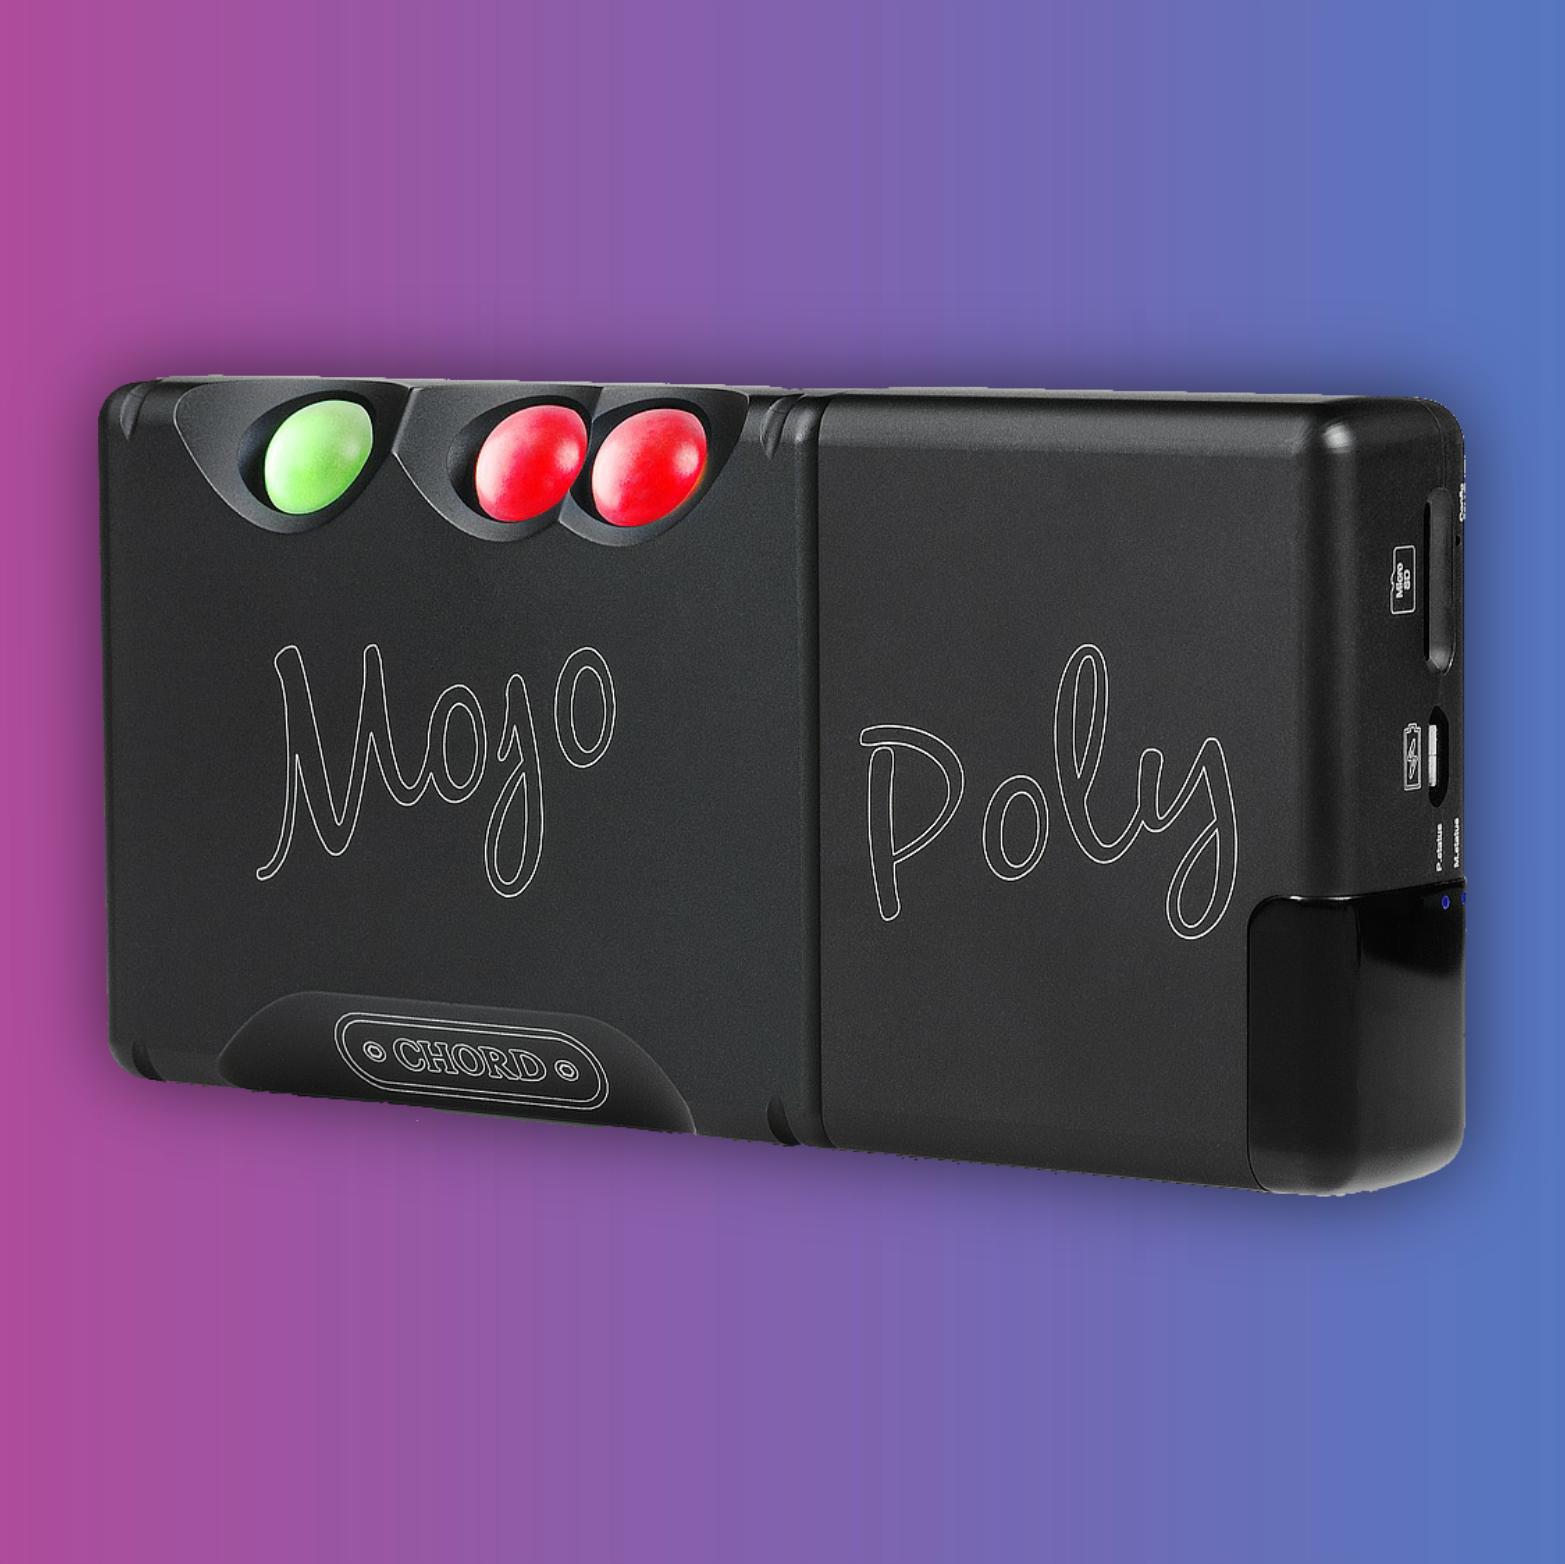 Chord Mojo: Kopfhörerverstärker (768kHz/32Bit, DSD256) + Chord Poly: Streaming Modul (Apple AirPlay, 2,4Ghz WiFi)